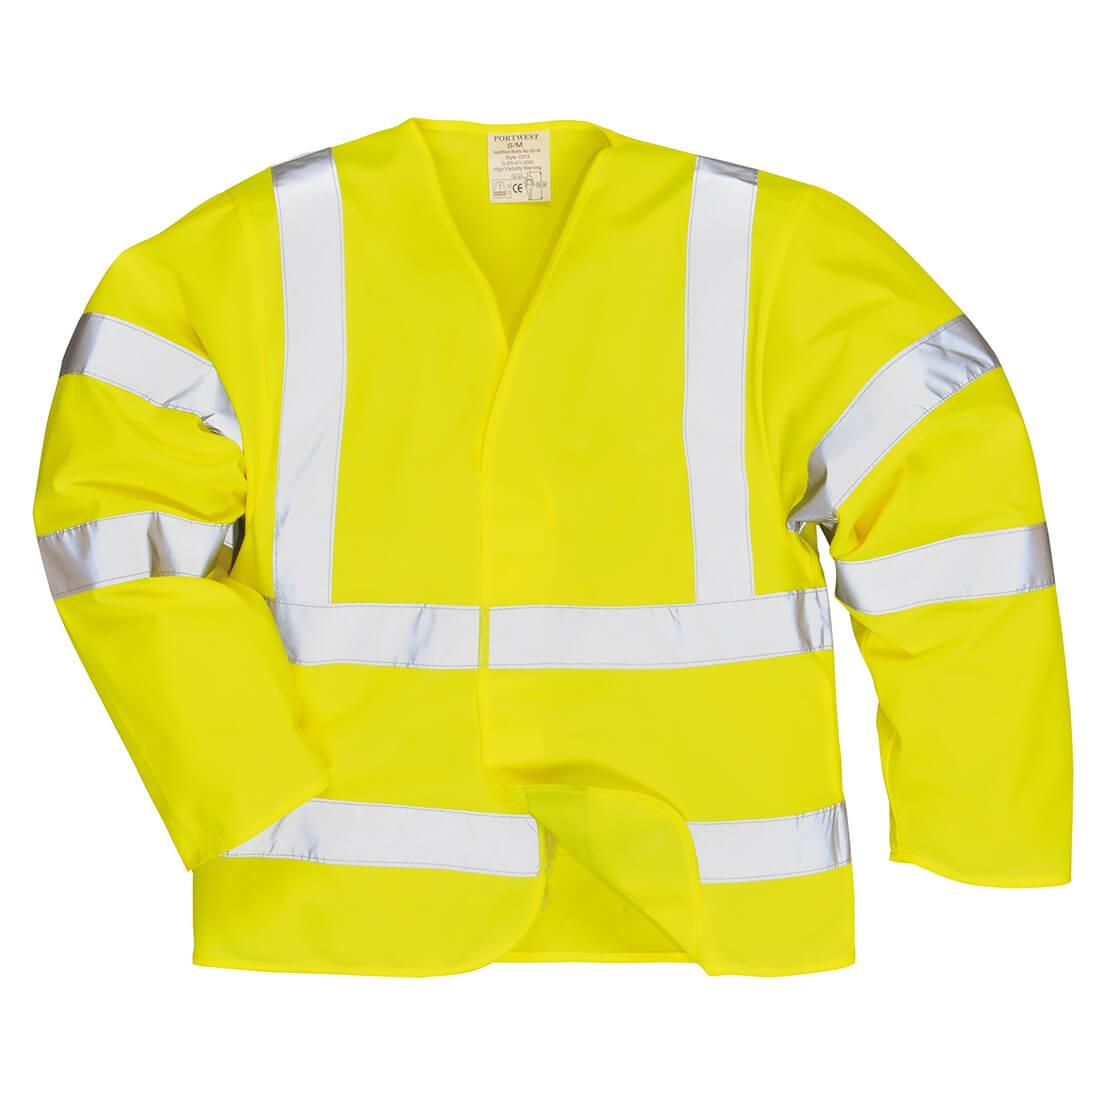 Image of Biz Flame Hi Vis Flame Resistant Jacket Yellow 2XL / 3XL